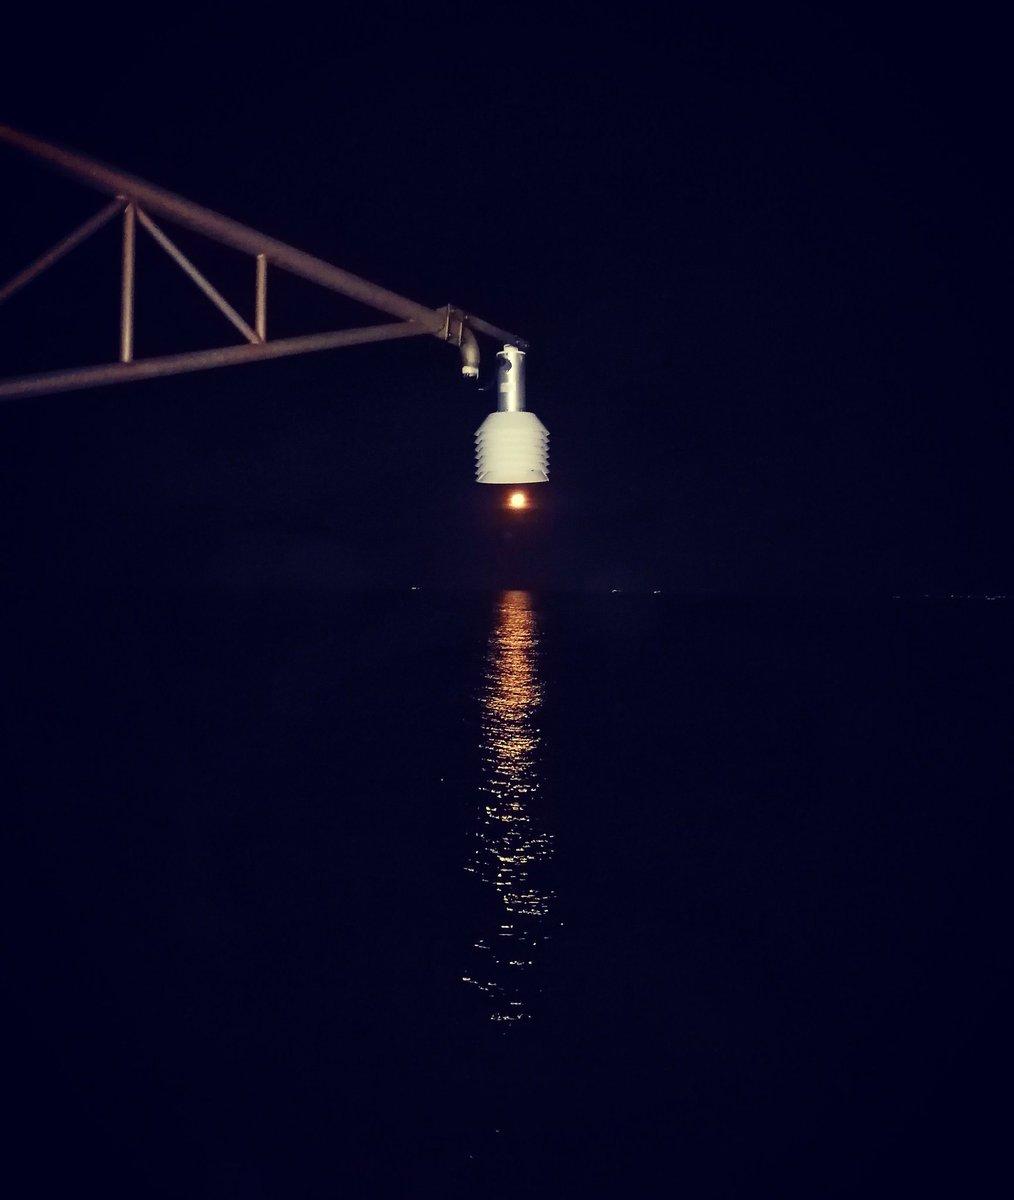 🌊🌉🌝💡Giochi di Luci💡🌝🌉🌊 #lalunanelmare🌕 #tramontodiluna #sea #night #light #moon #moonlight #lifeonthesea #november2020